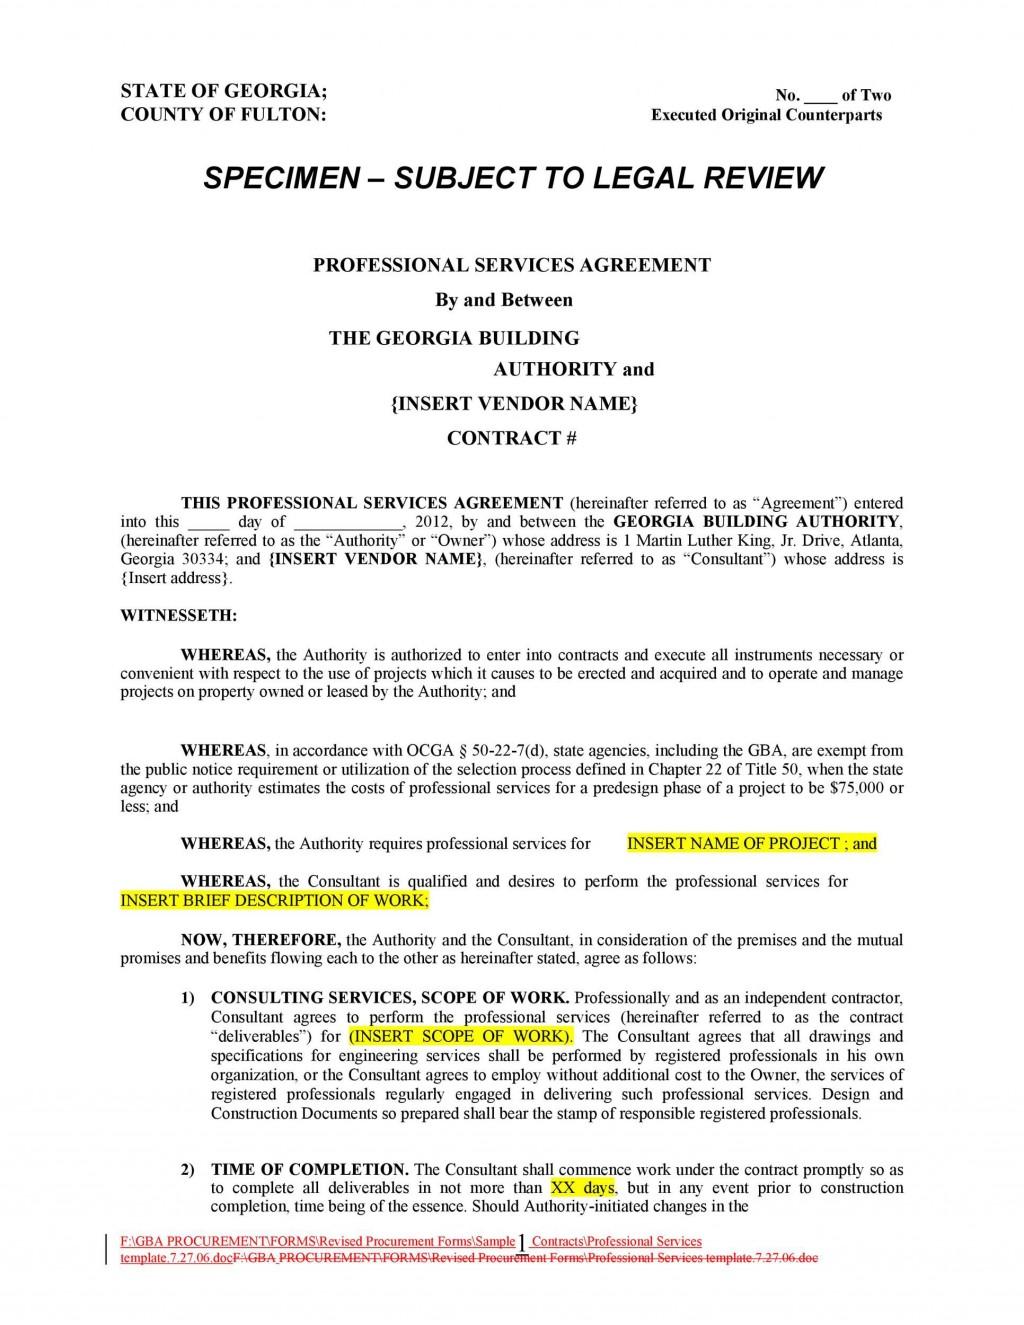 008 Stunning Service Level Agreement Template High Def  South Africa Nz For Website DevelopmentLarge